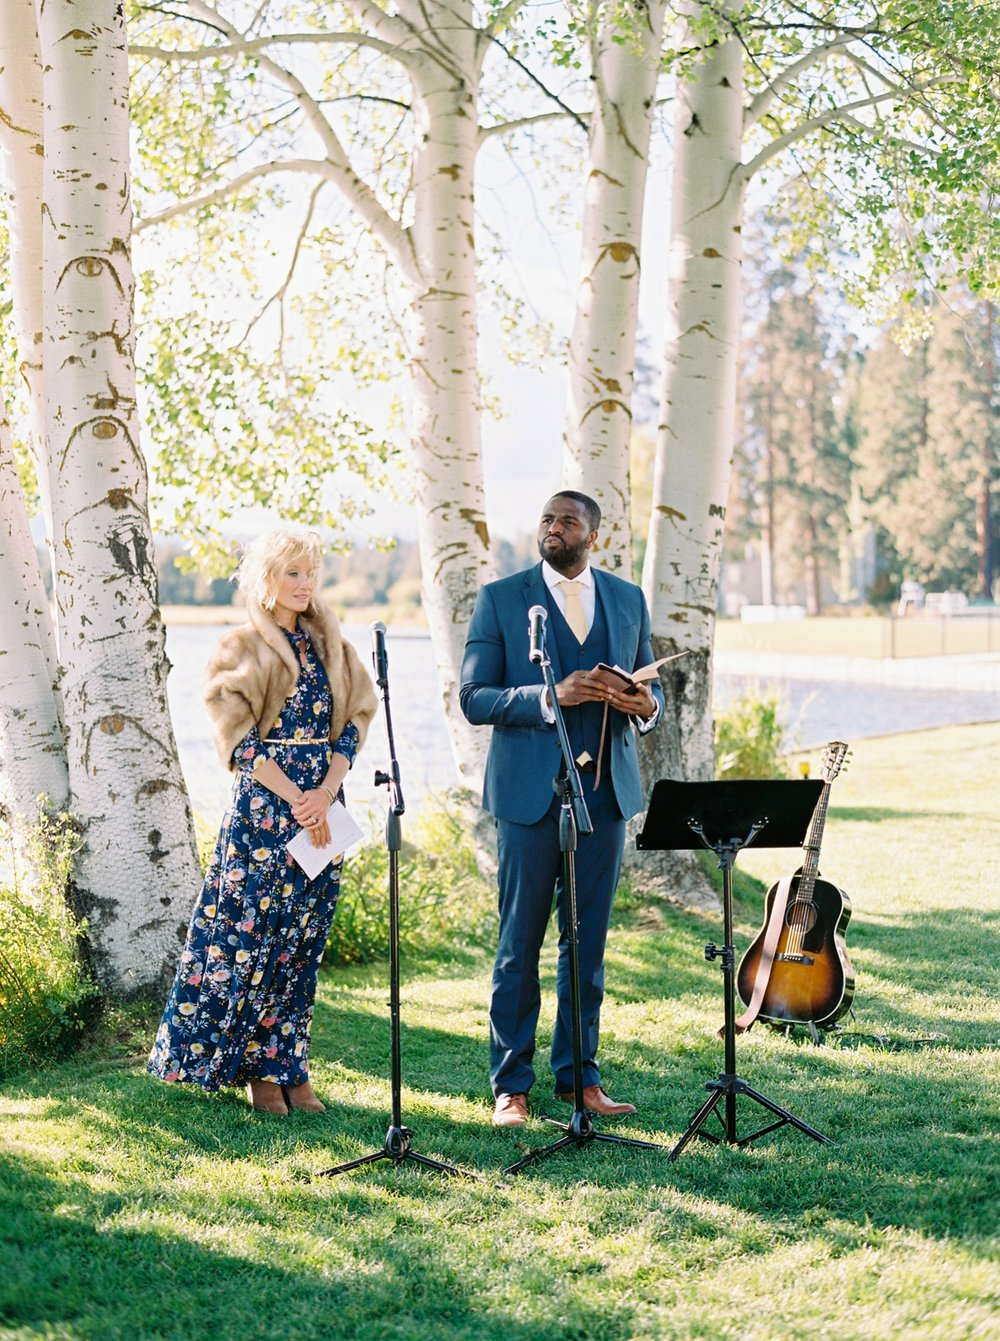 Calgary wedding photographers | oregon wedding photographers | fine art film | Justine Milton Photography | oregon wedding | wedding ceremony | wedding music